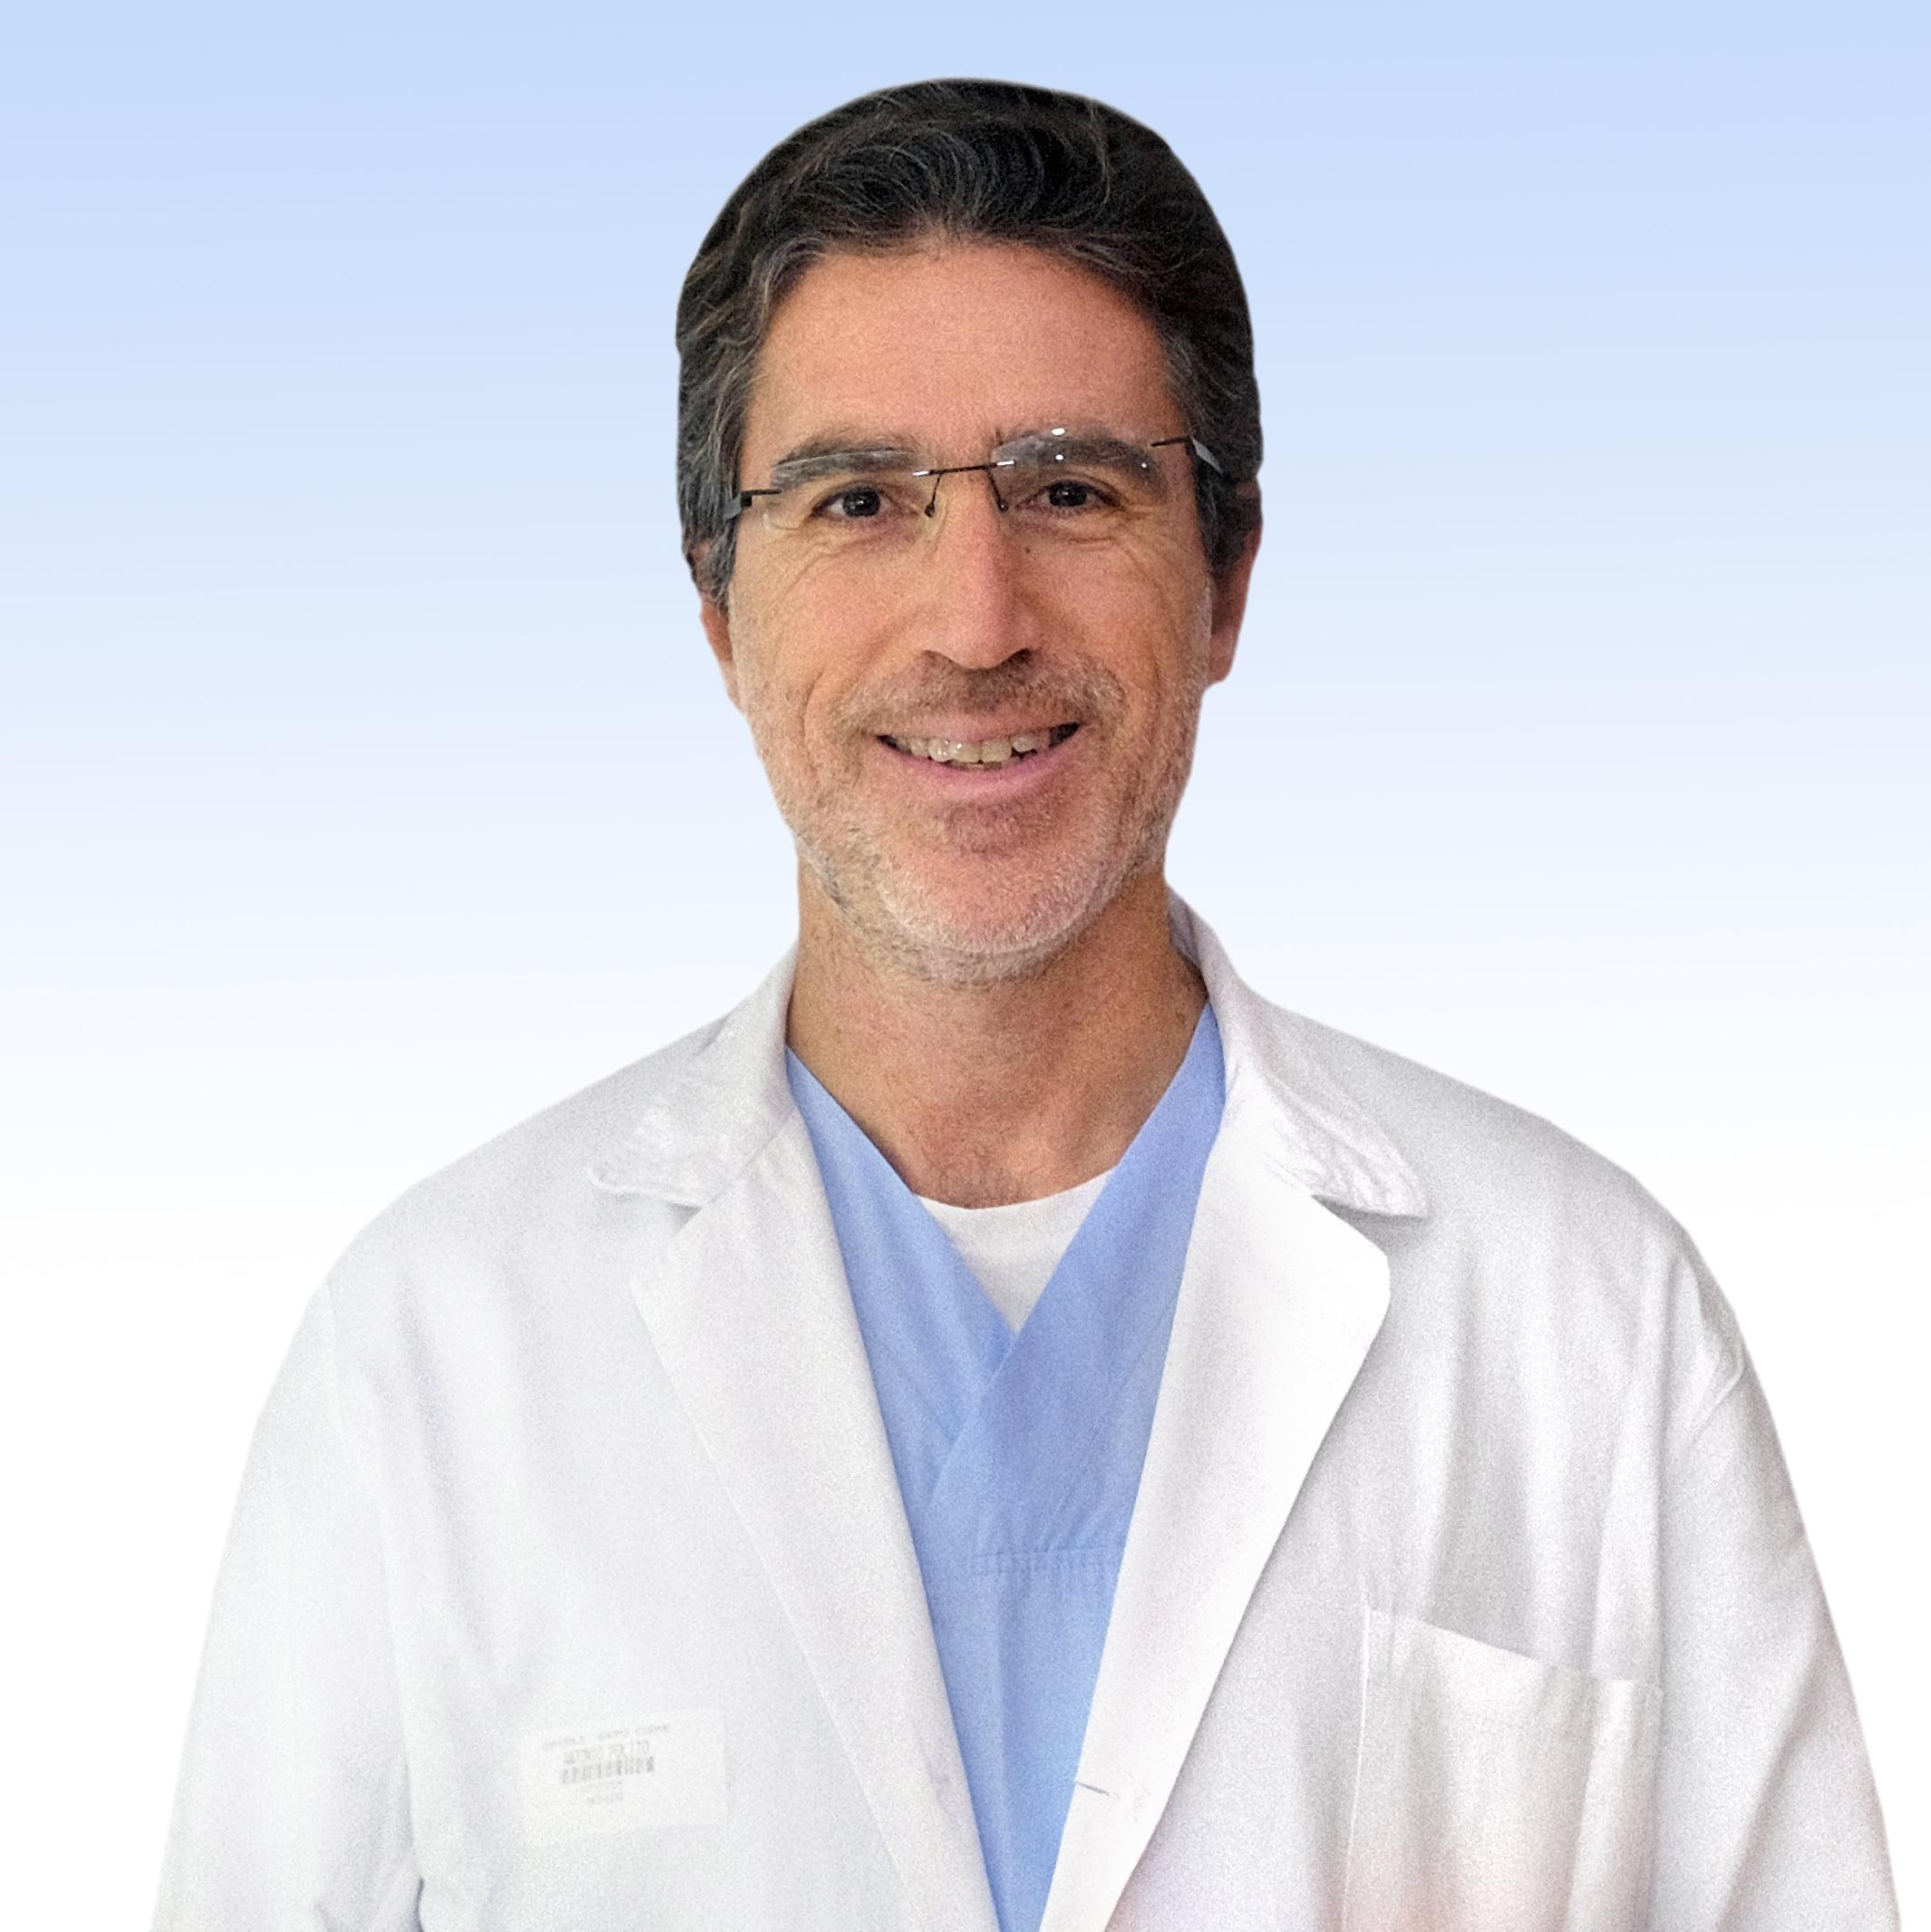 Antonio Politi, oculista IRCCS Ospedale Sacro Cuore Don Calabria di Negrar